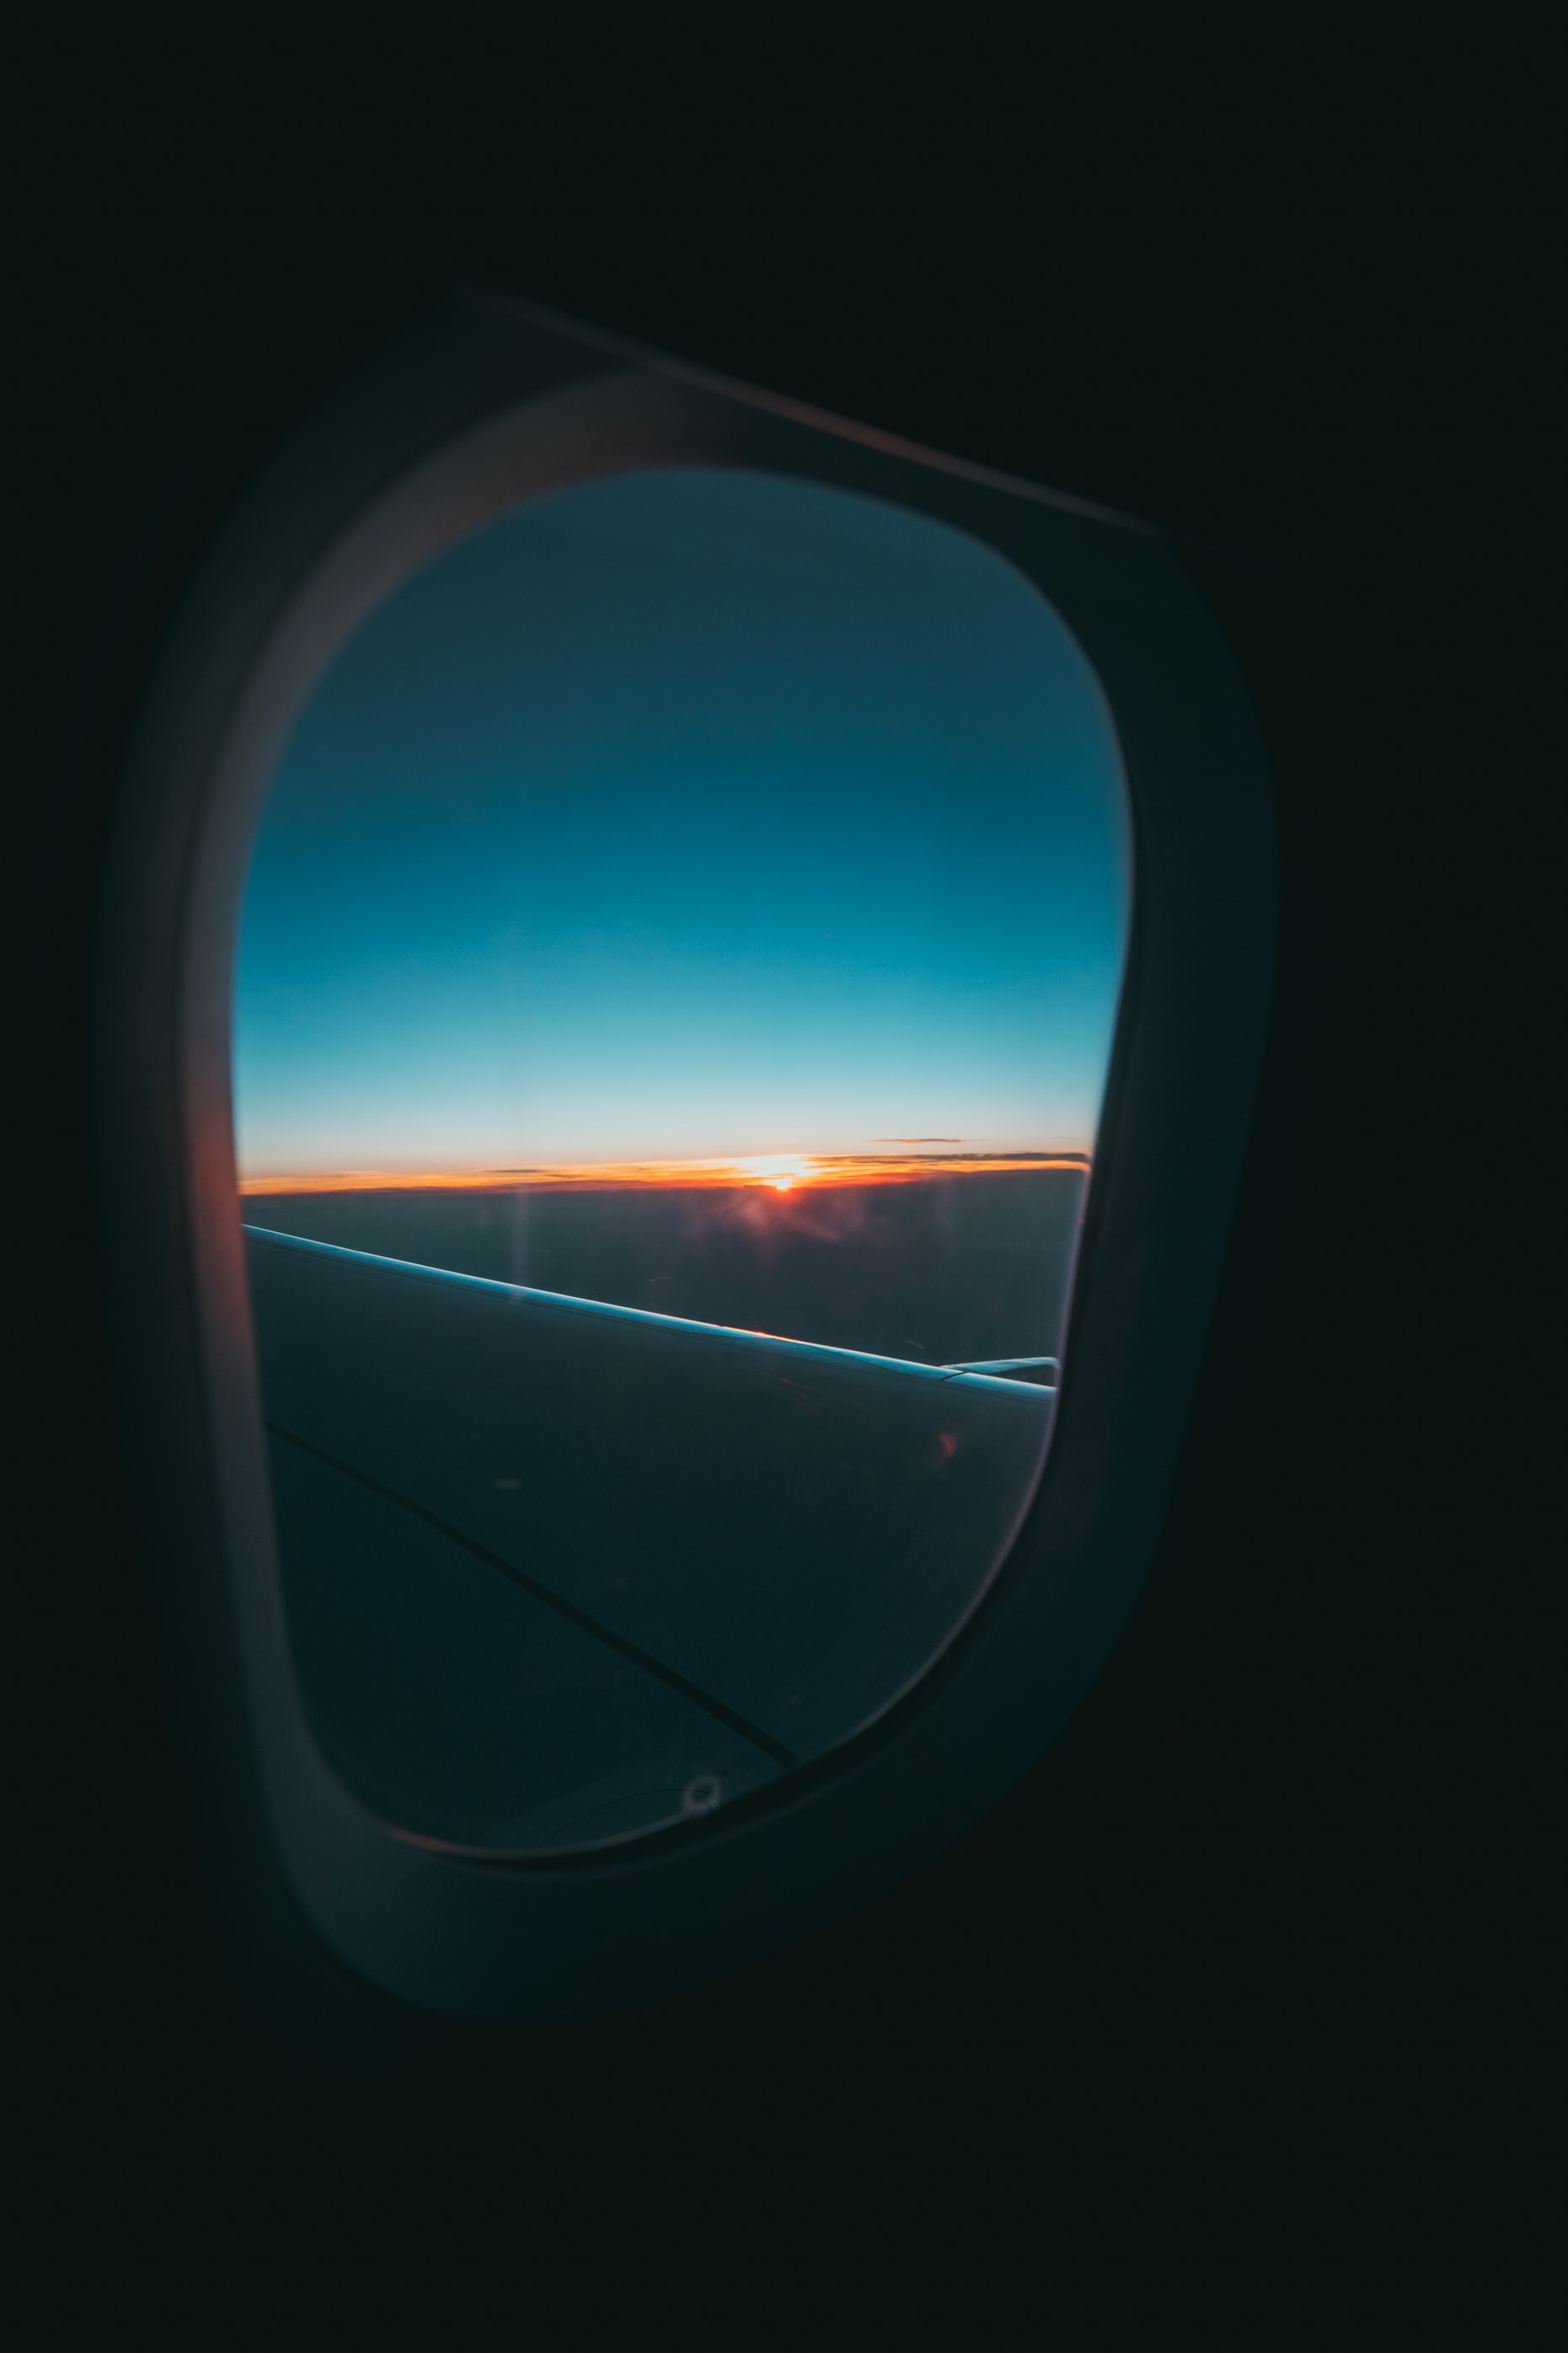 window's plane photography of cloud